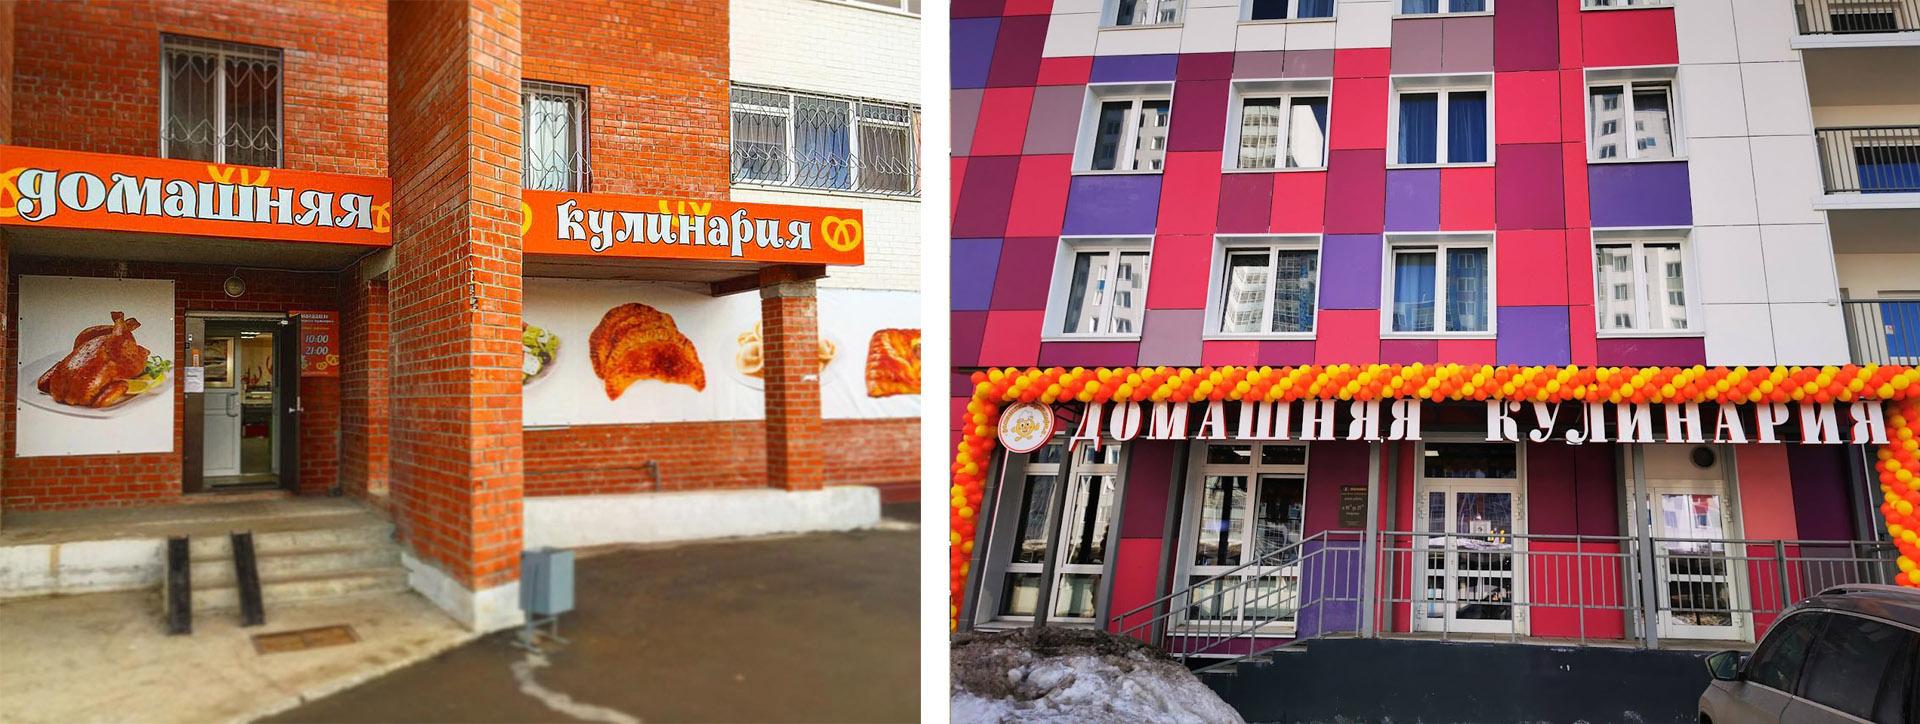 Домашняя Кулинария - Пермь